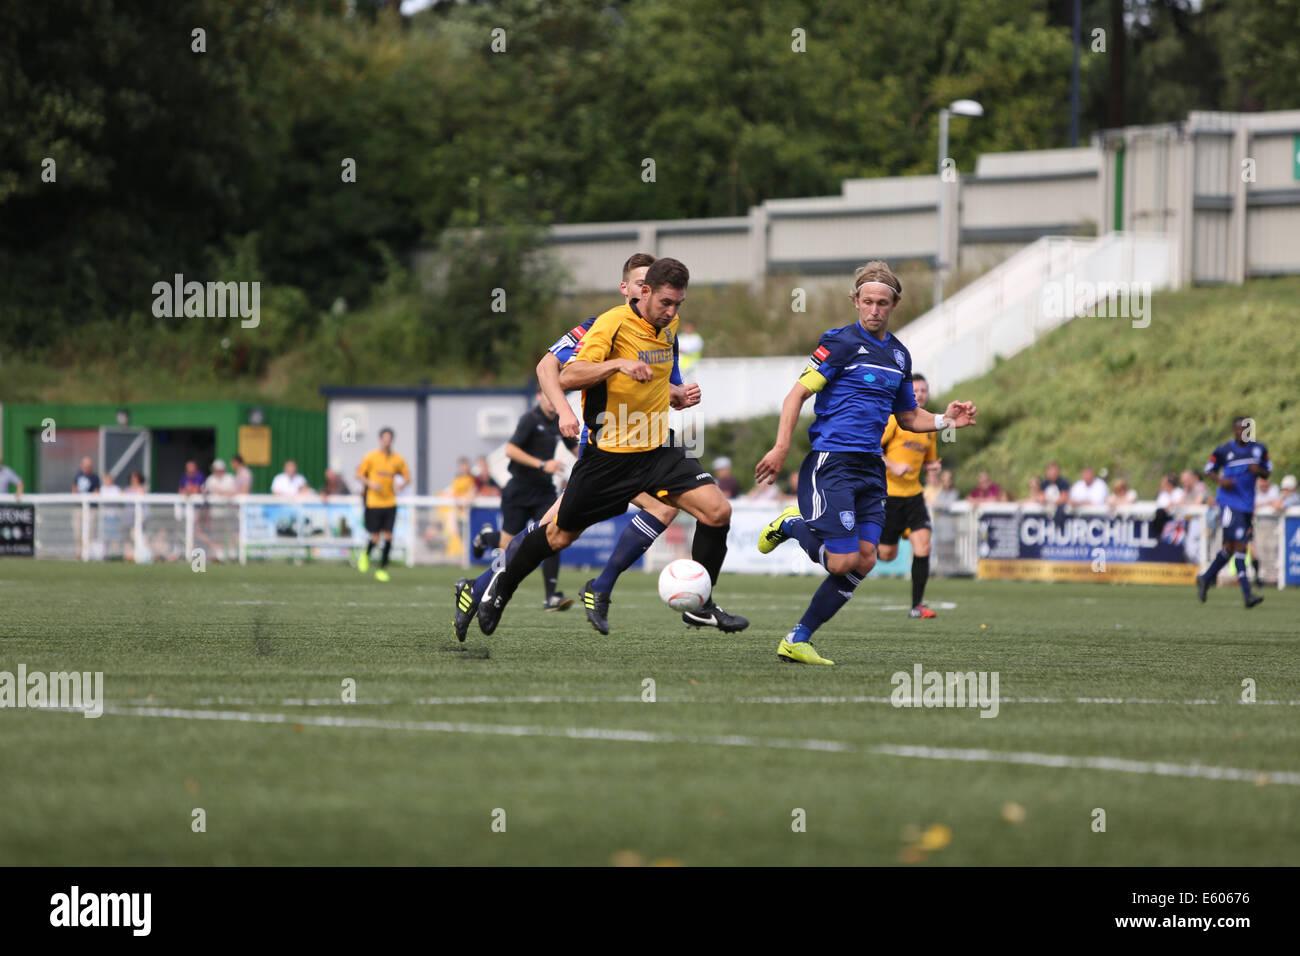 Maidstone, UK. 9th August, 2014. Ryman League premier division gallagher stadium, Maidstone UTD VS Metropolitan - Stock Image